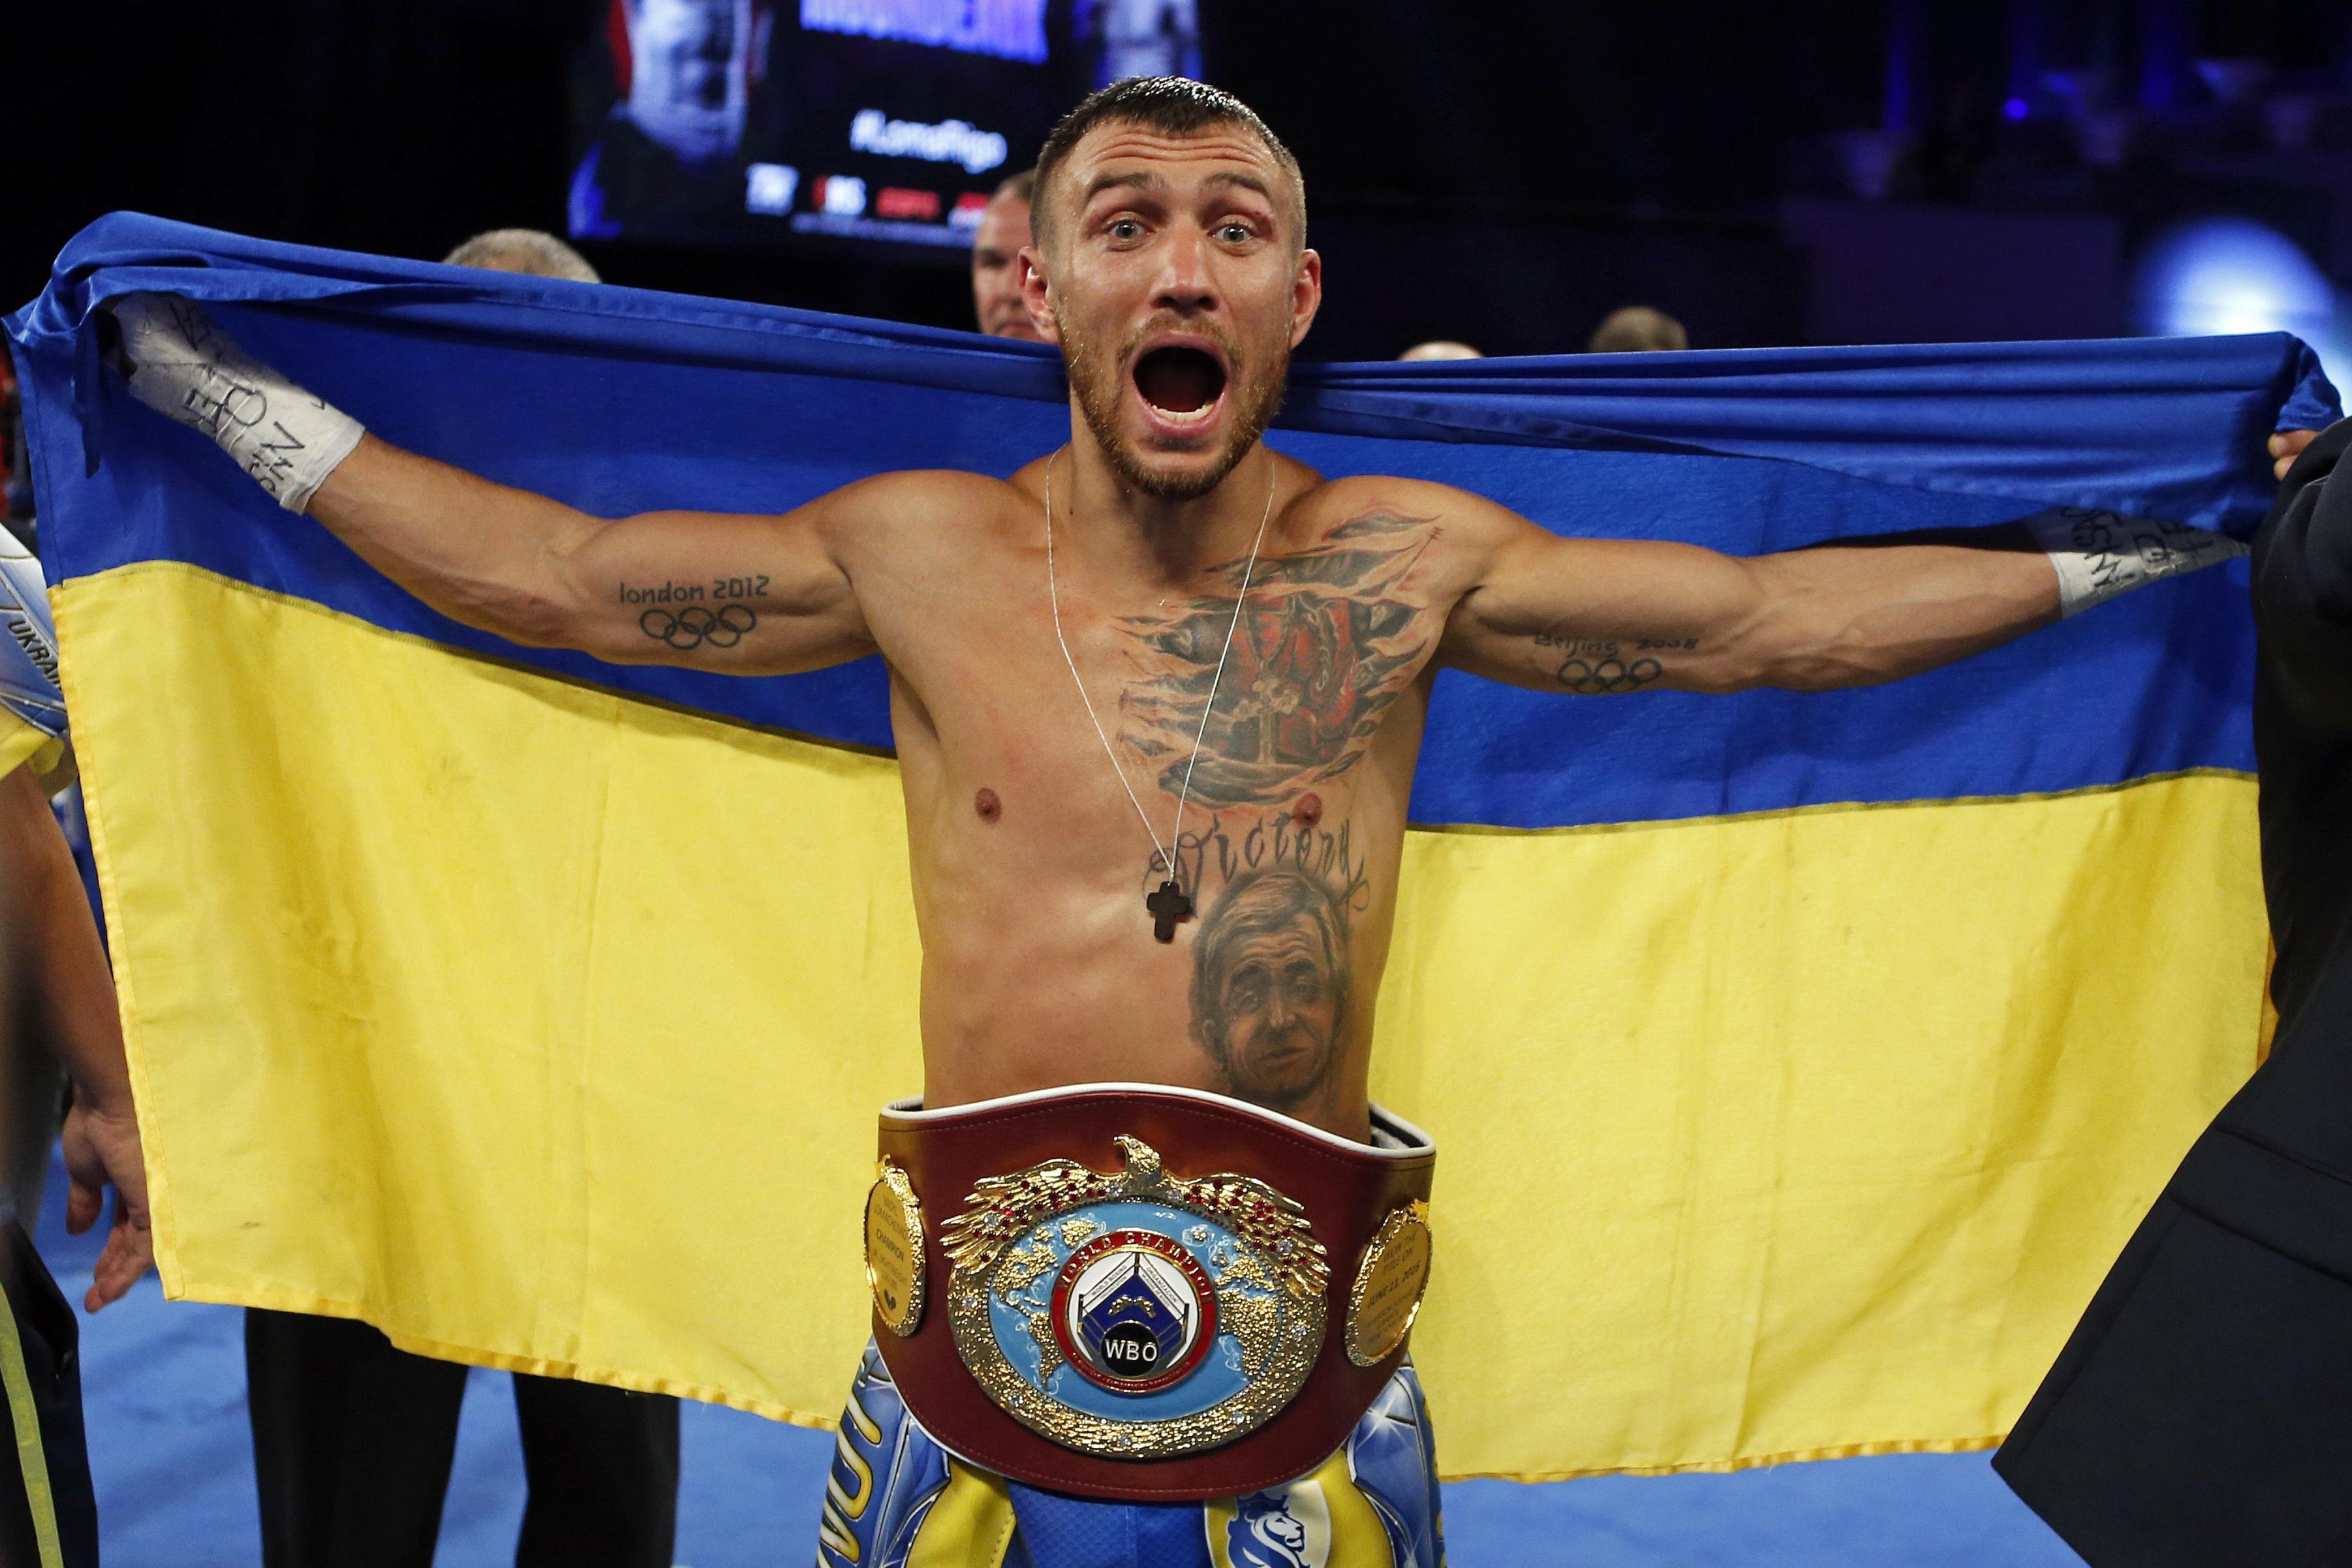 The Filipino legend also has eyes on a showdown with Vasyl Lomachenko